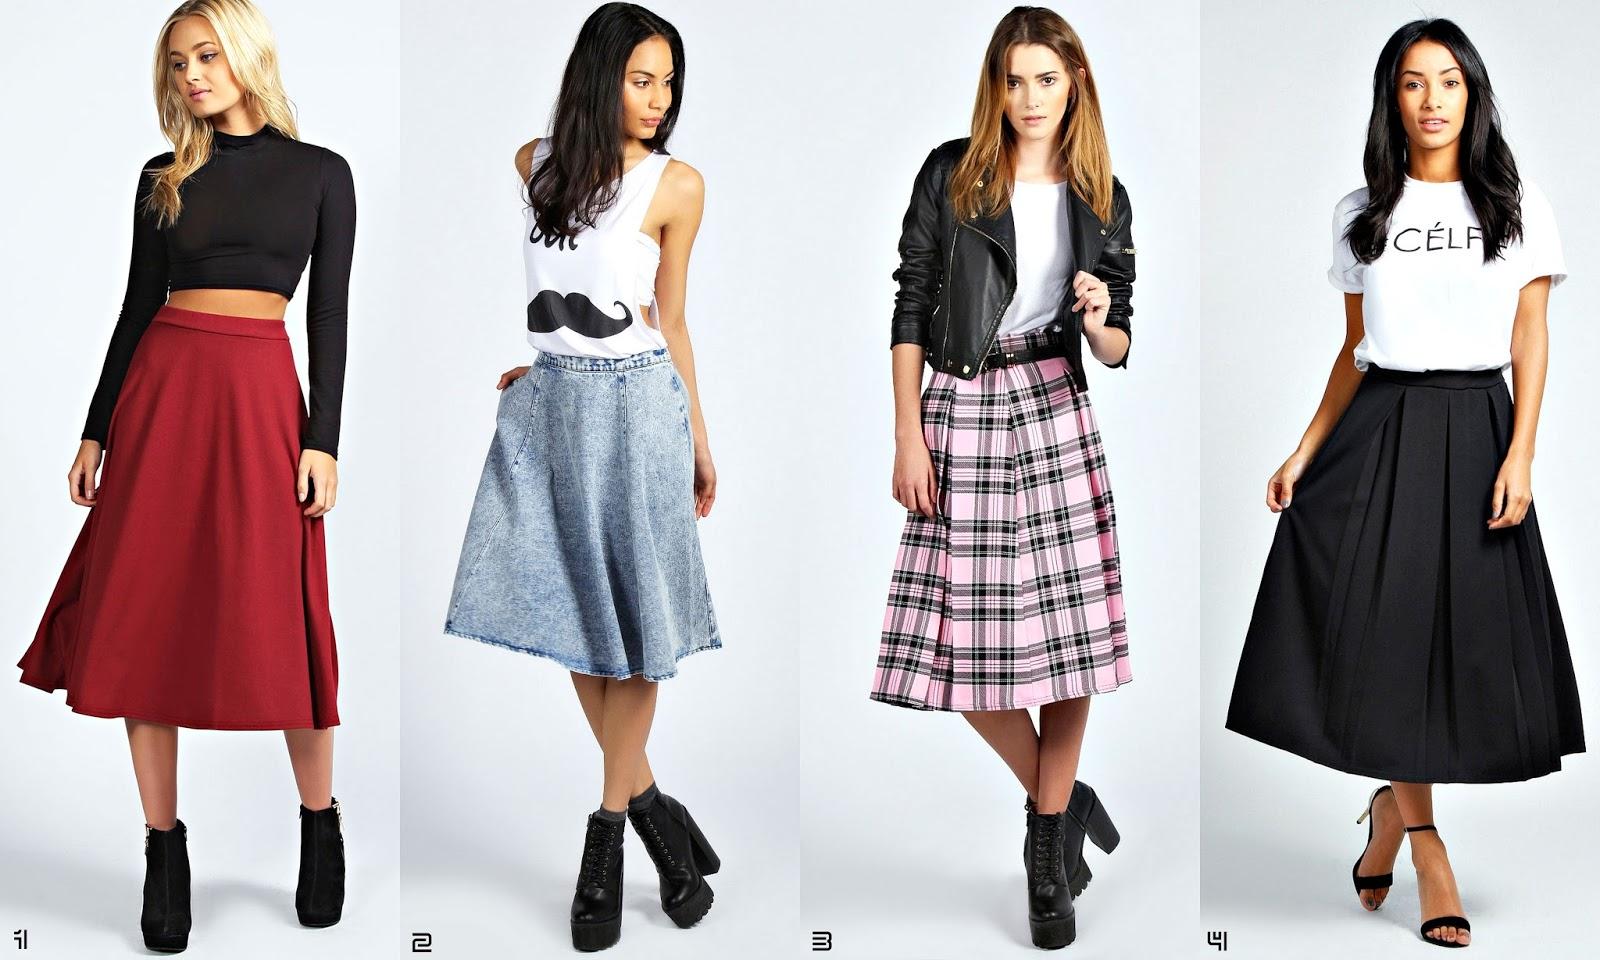 Frills and Thrills: The Midi Skirt Trend